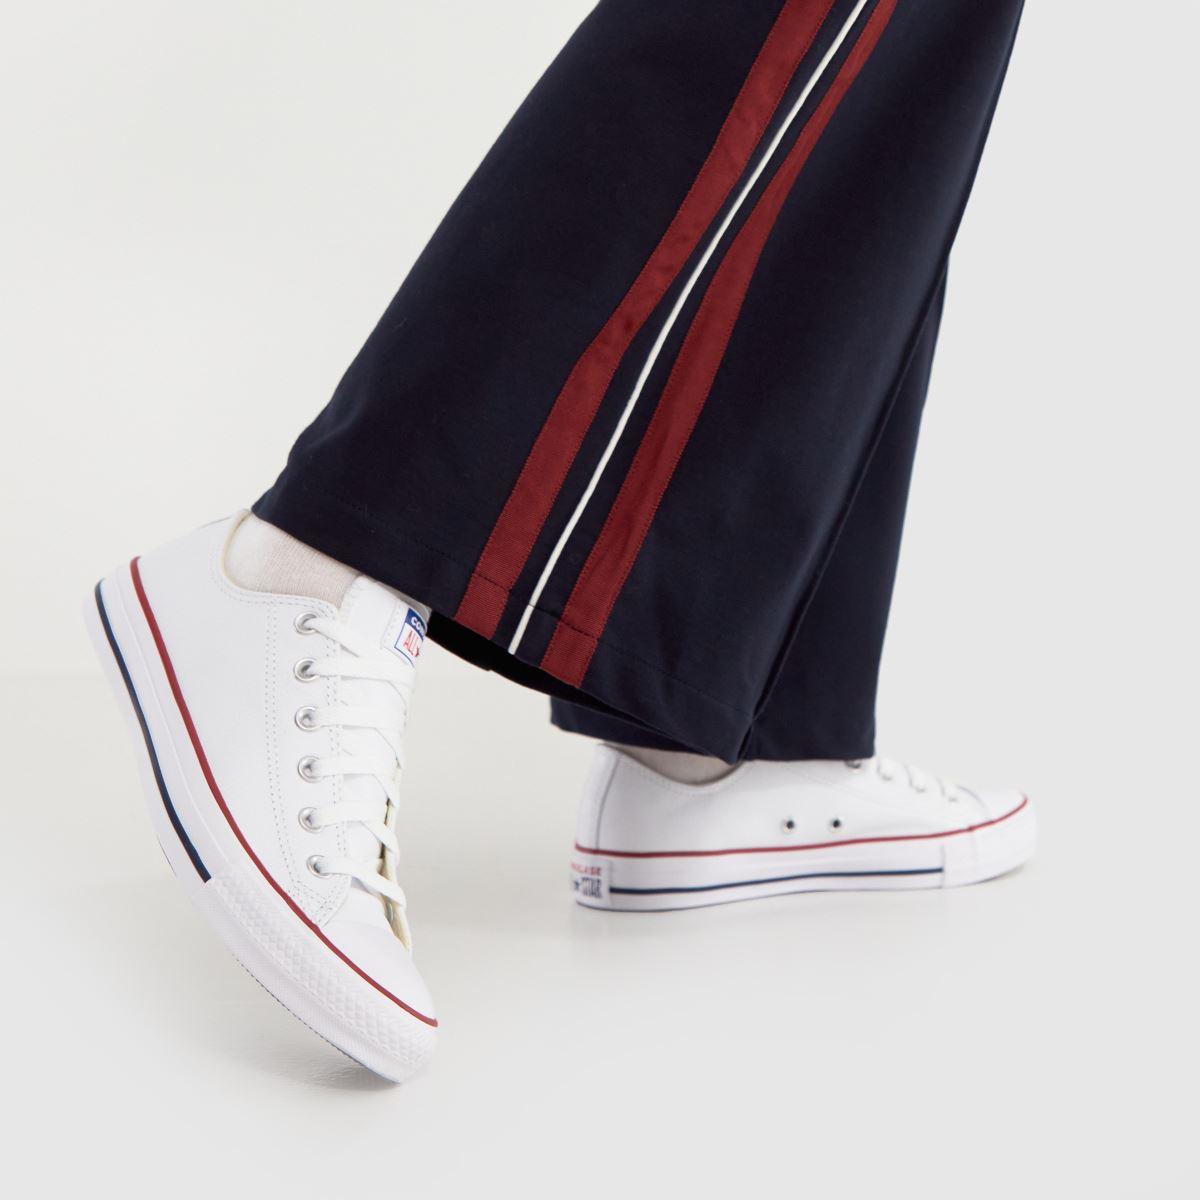 Damen Weiß converse All Star Oxford Leather Sneaker   schuh Gute Qualität beliebte Schuhe